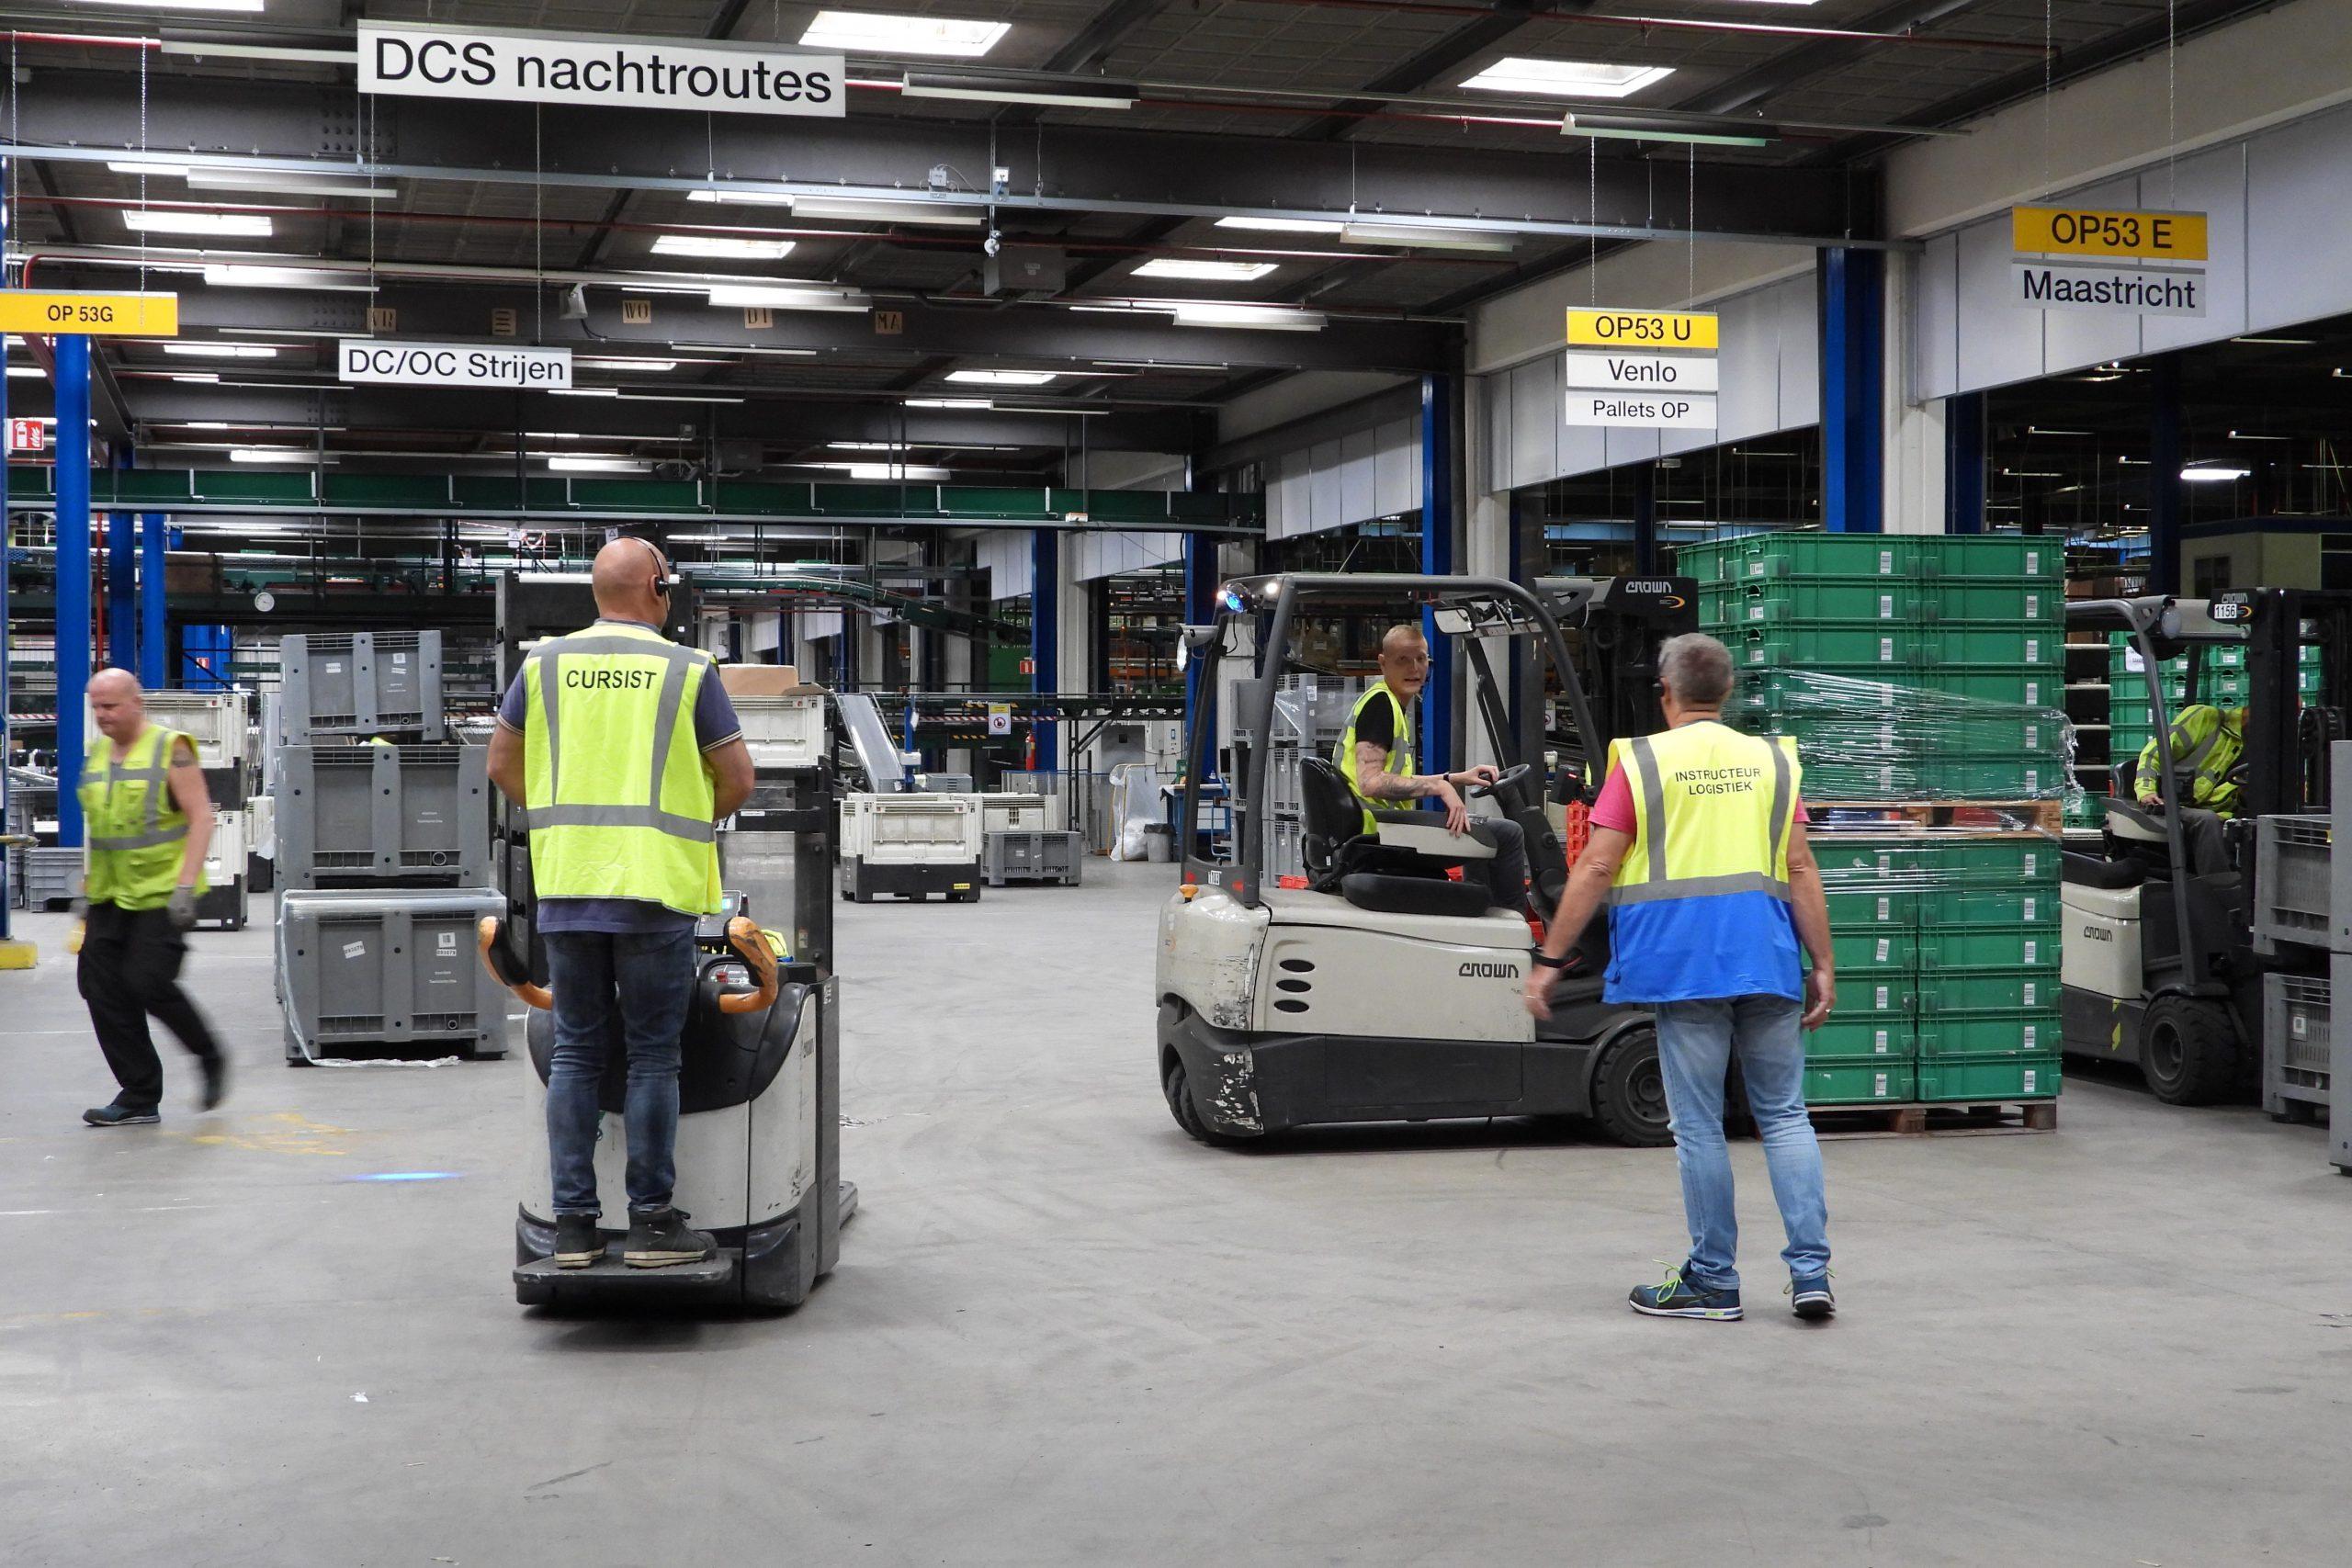 axiwi-draadloos-communicatie-systeem-logistiek-productieomgeving